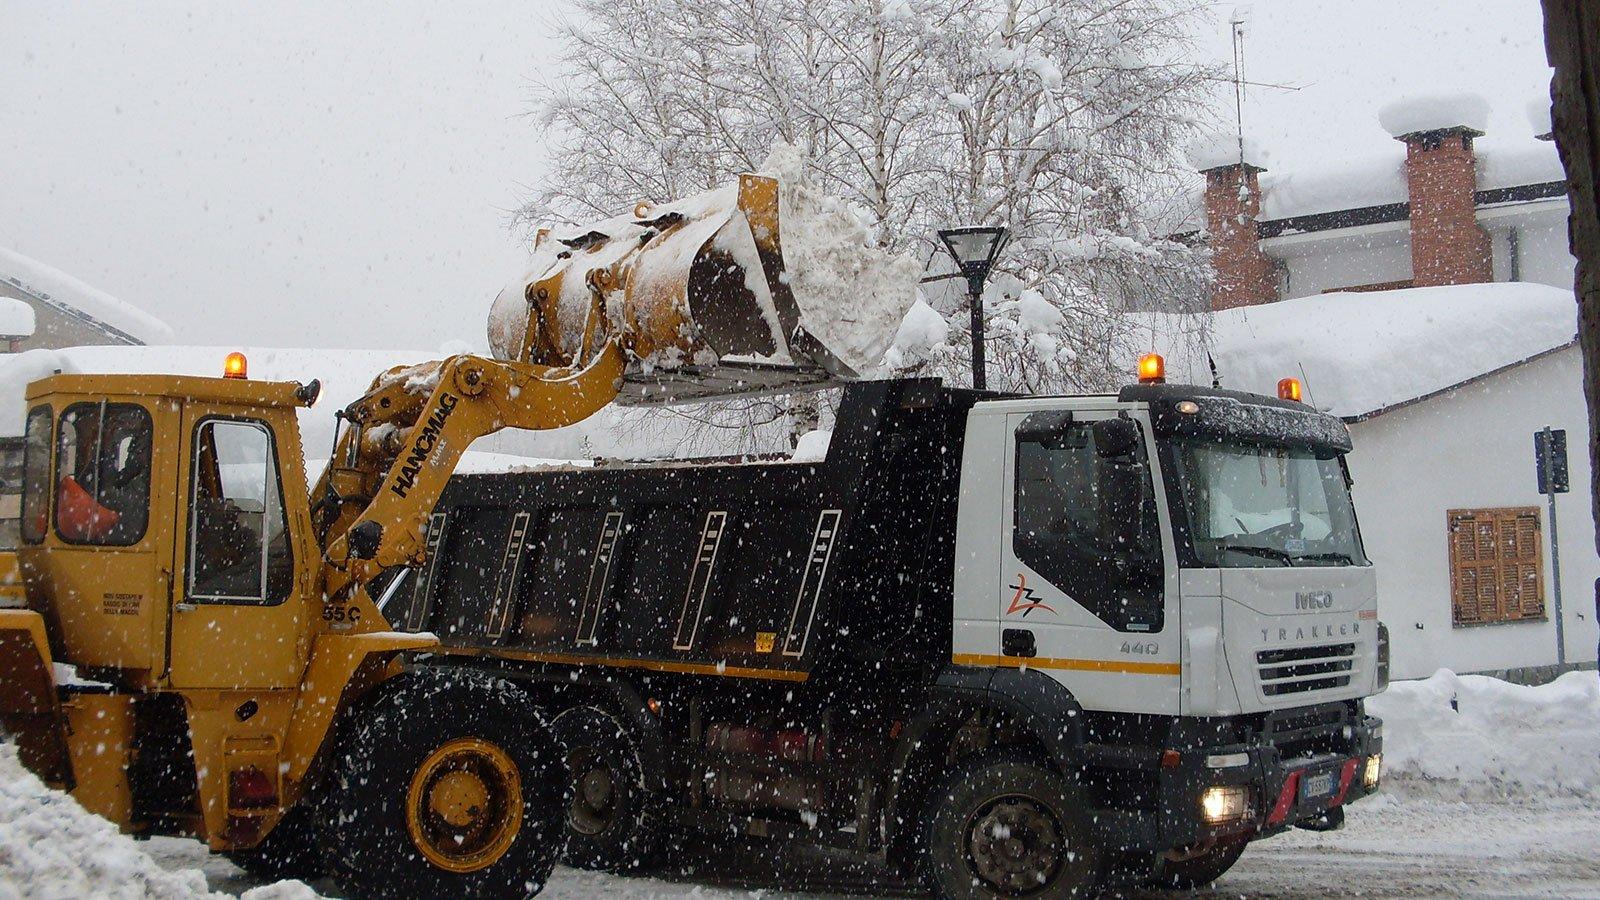 escavatore e camion trasportando neve